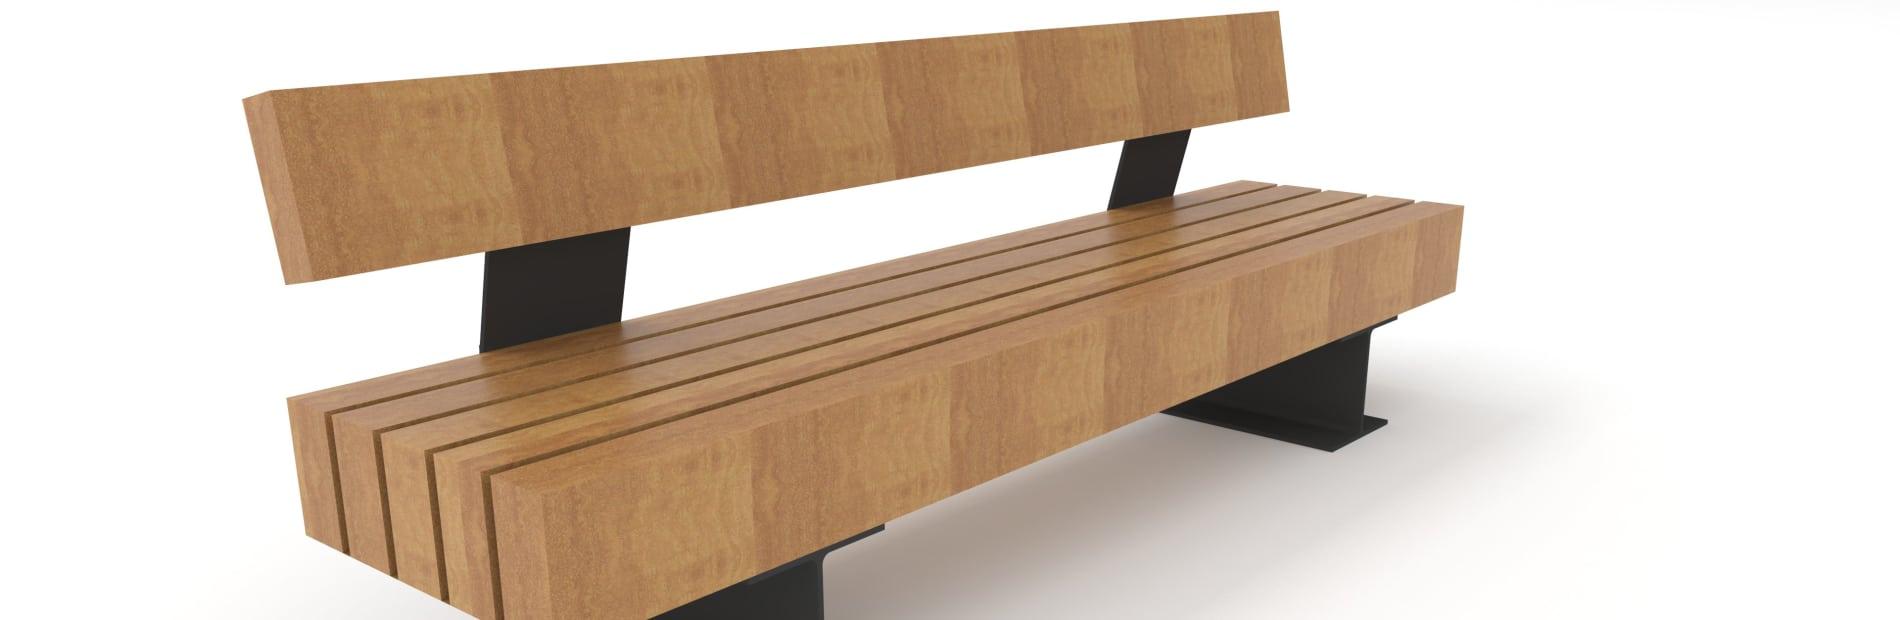 tramet seat